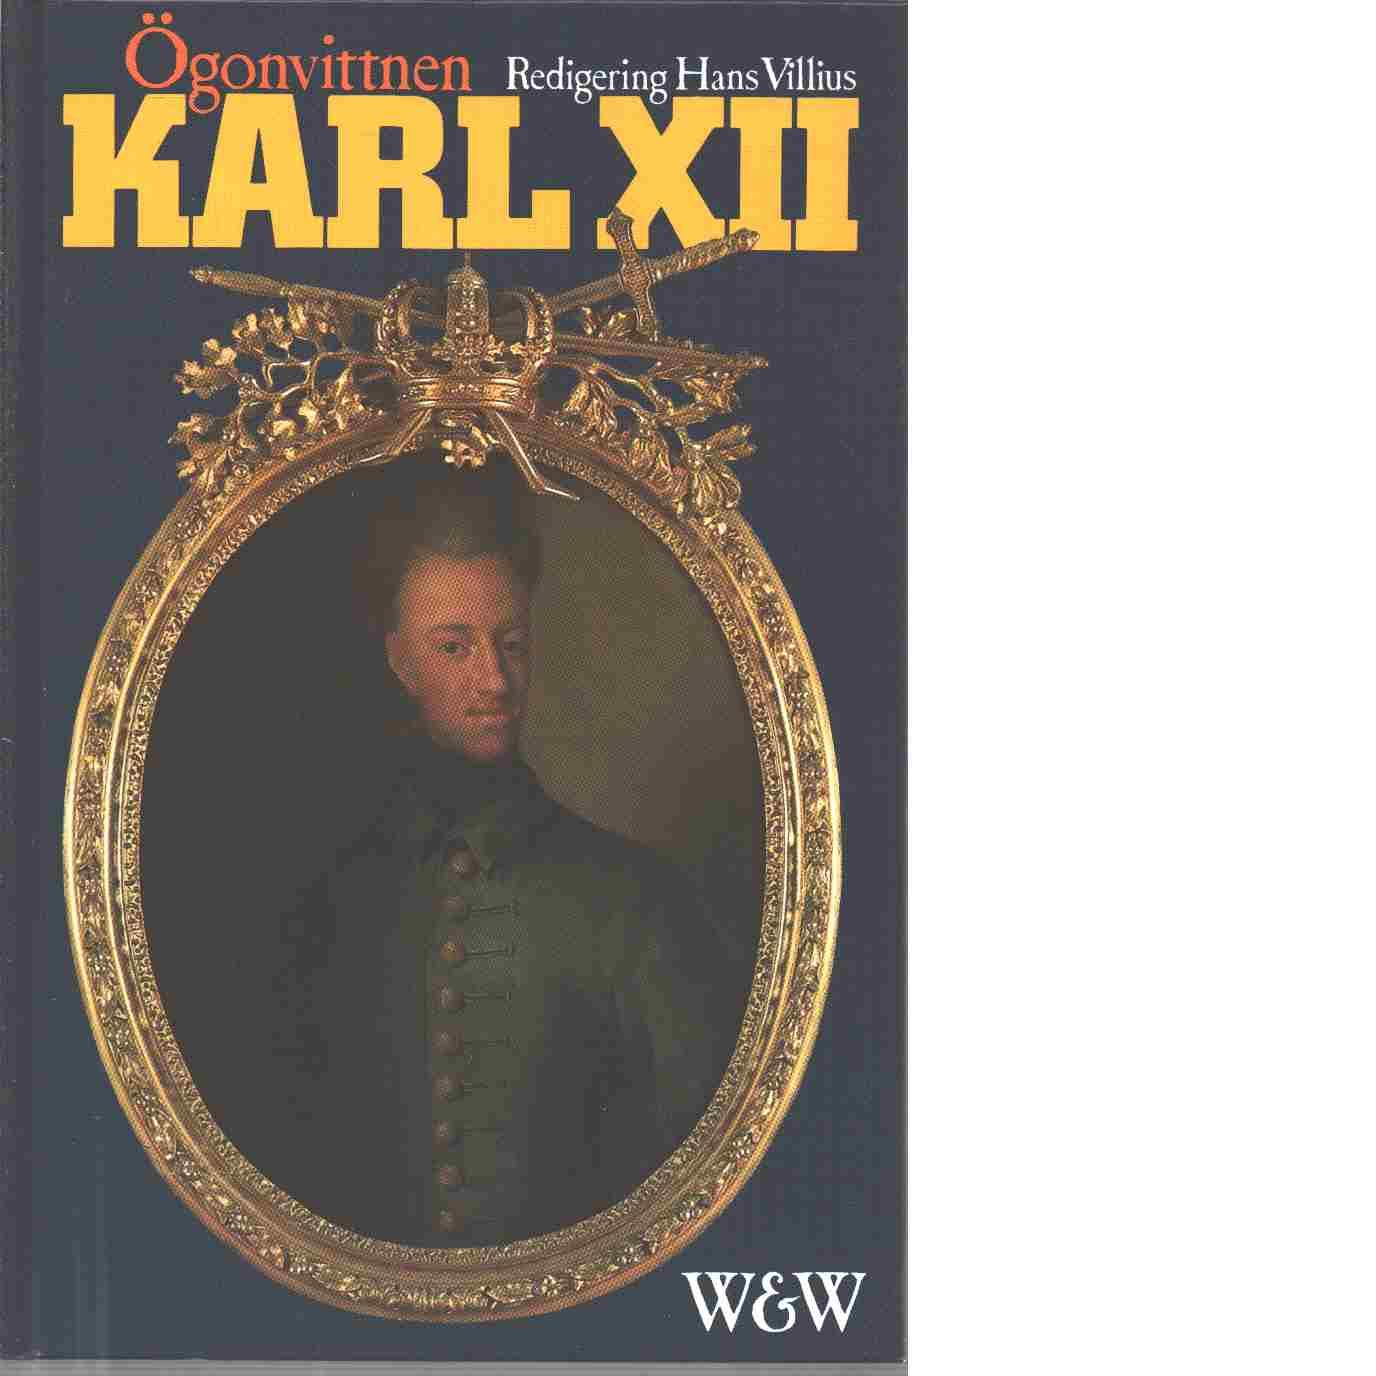 Karl XII - Red. Villius, Hans